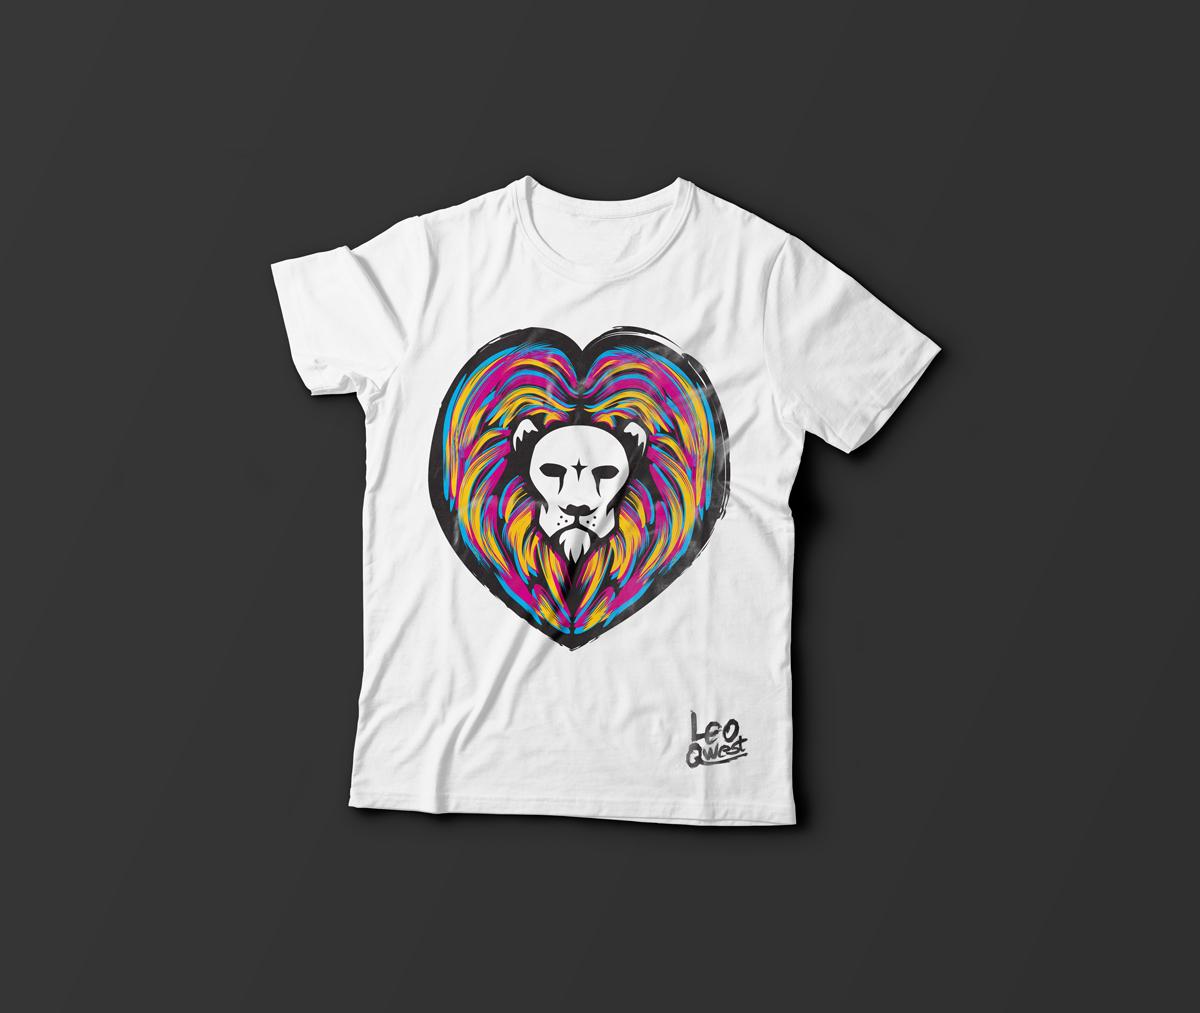 Leo Qwest, T-shirt Design